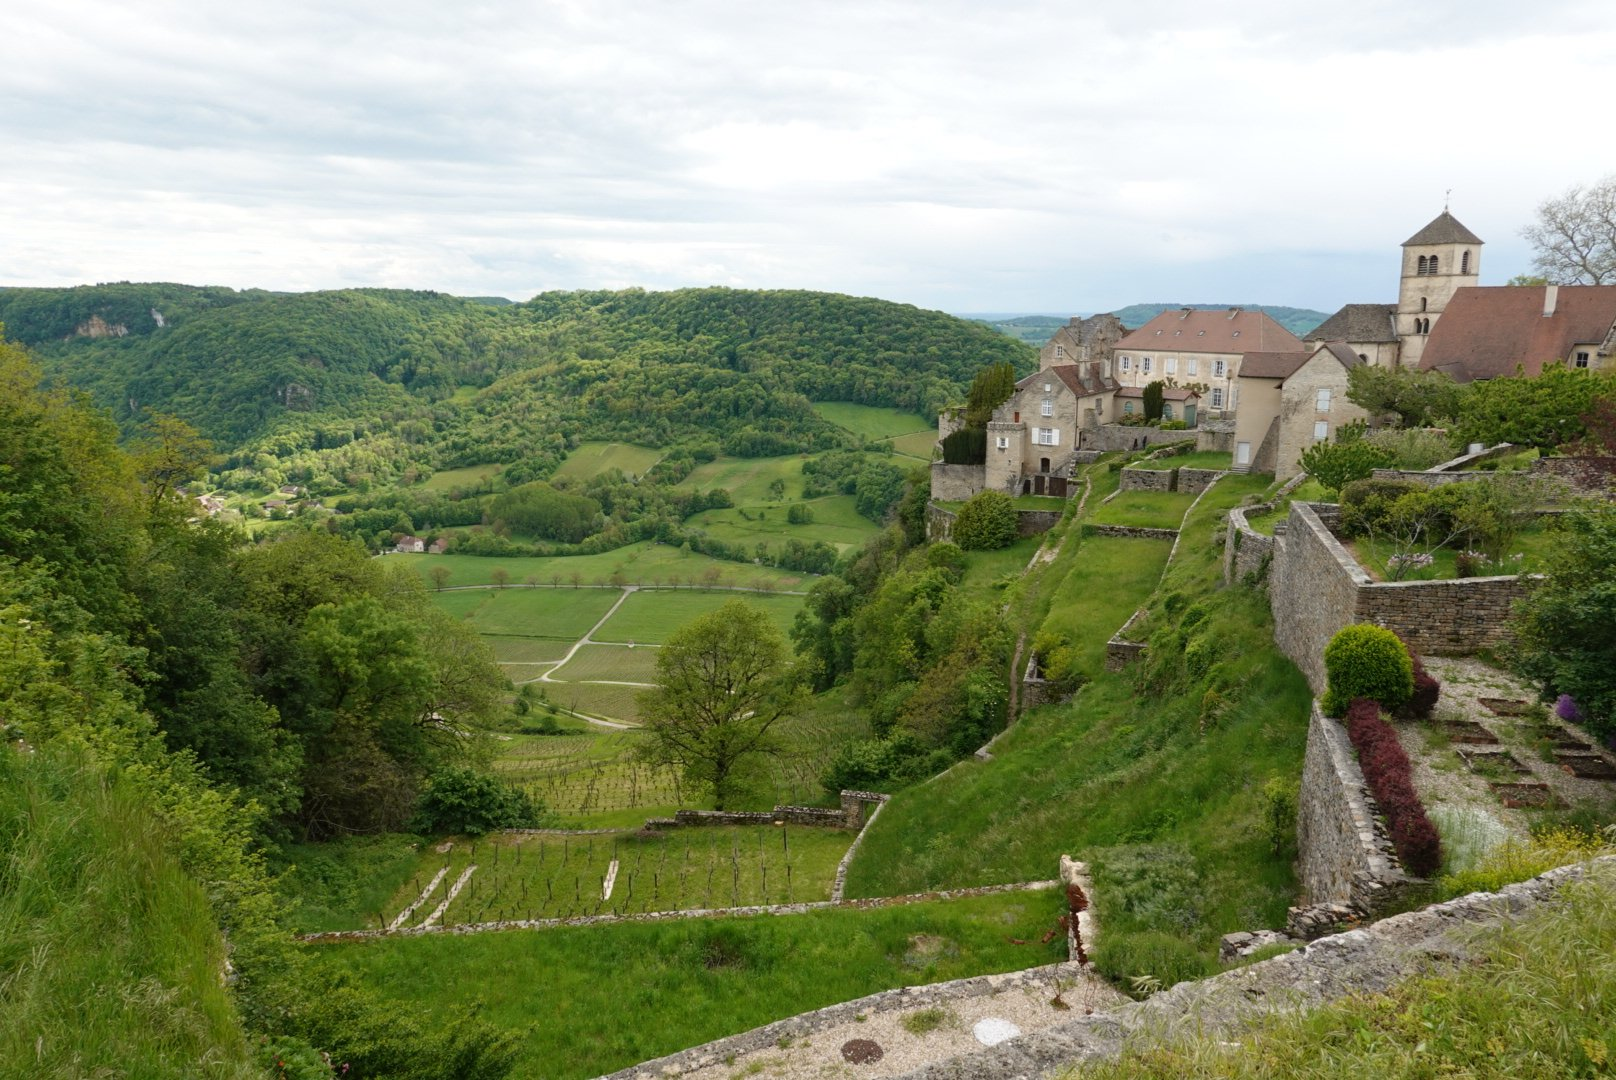 22 mai : Le vignoble du Jura